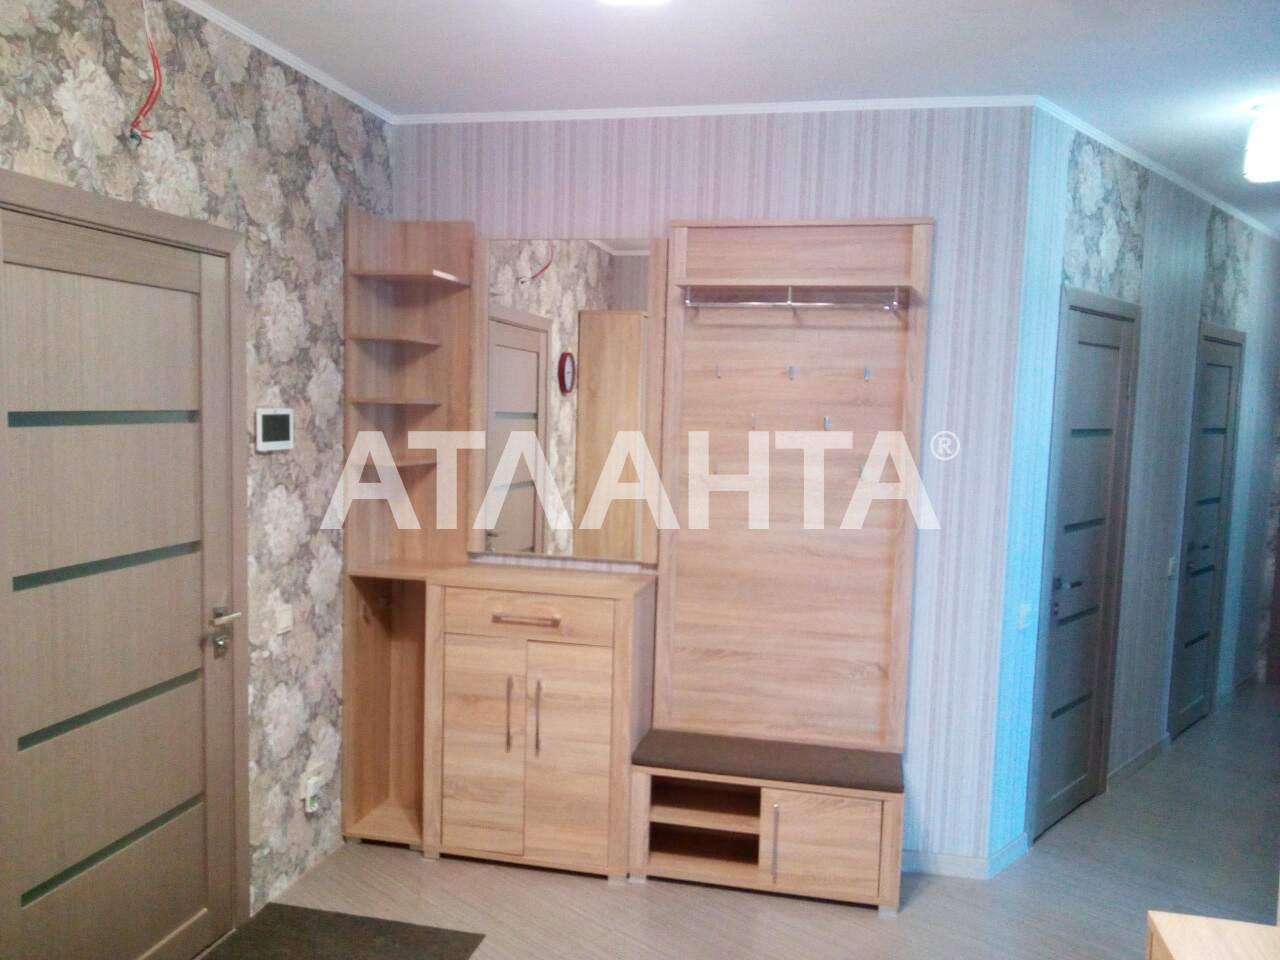 Продается 3-комнатная Квартира на ул. Просп. Глушкова — 139 000 у.е. (фото №6)